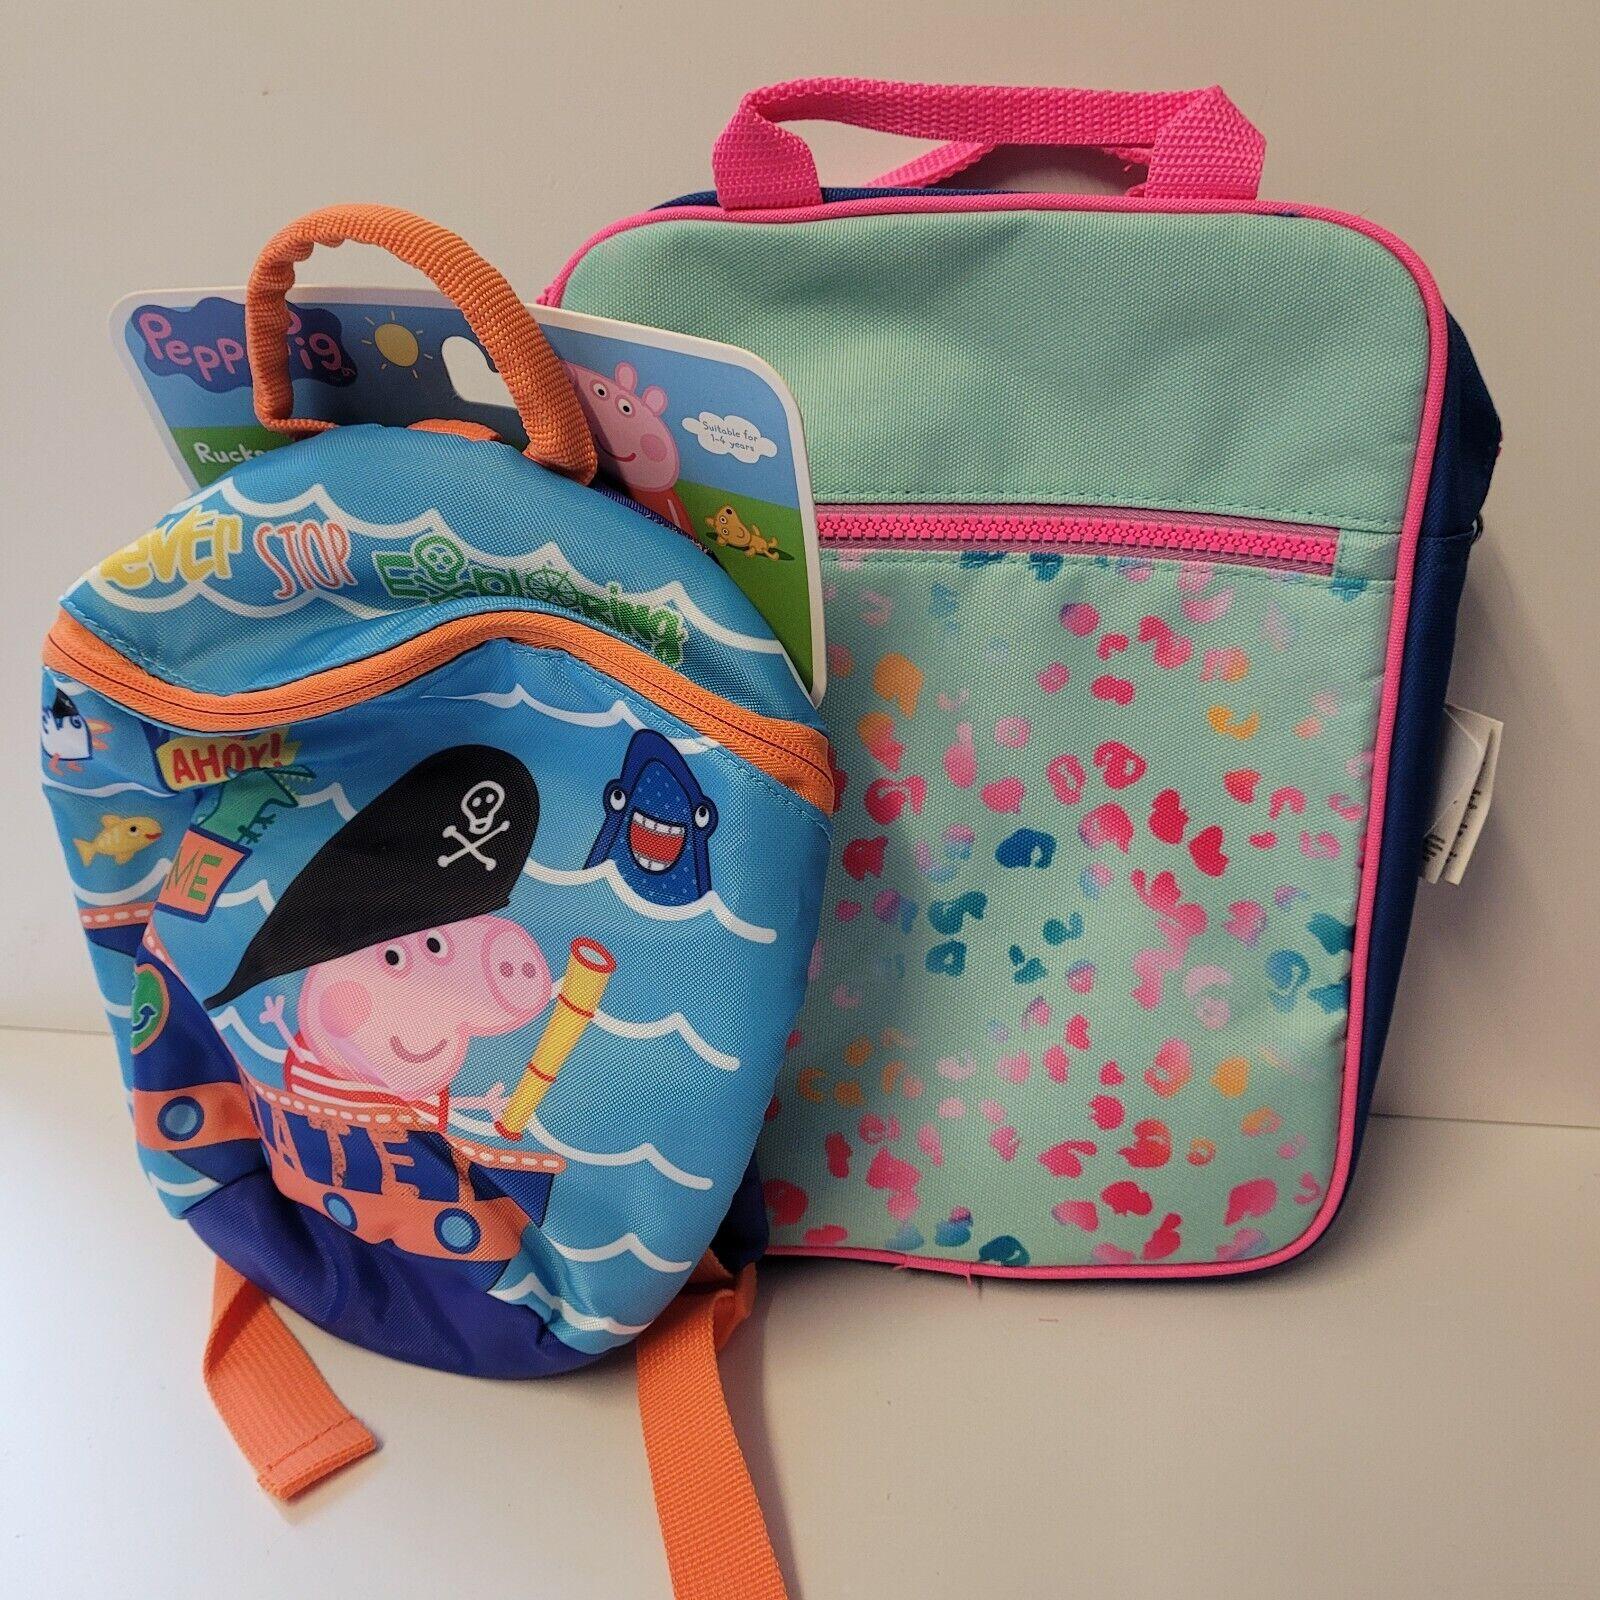 ‼️BRAND NEW‼️Peppa Pig George Backpack With Reins + girls pink school backpack